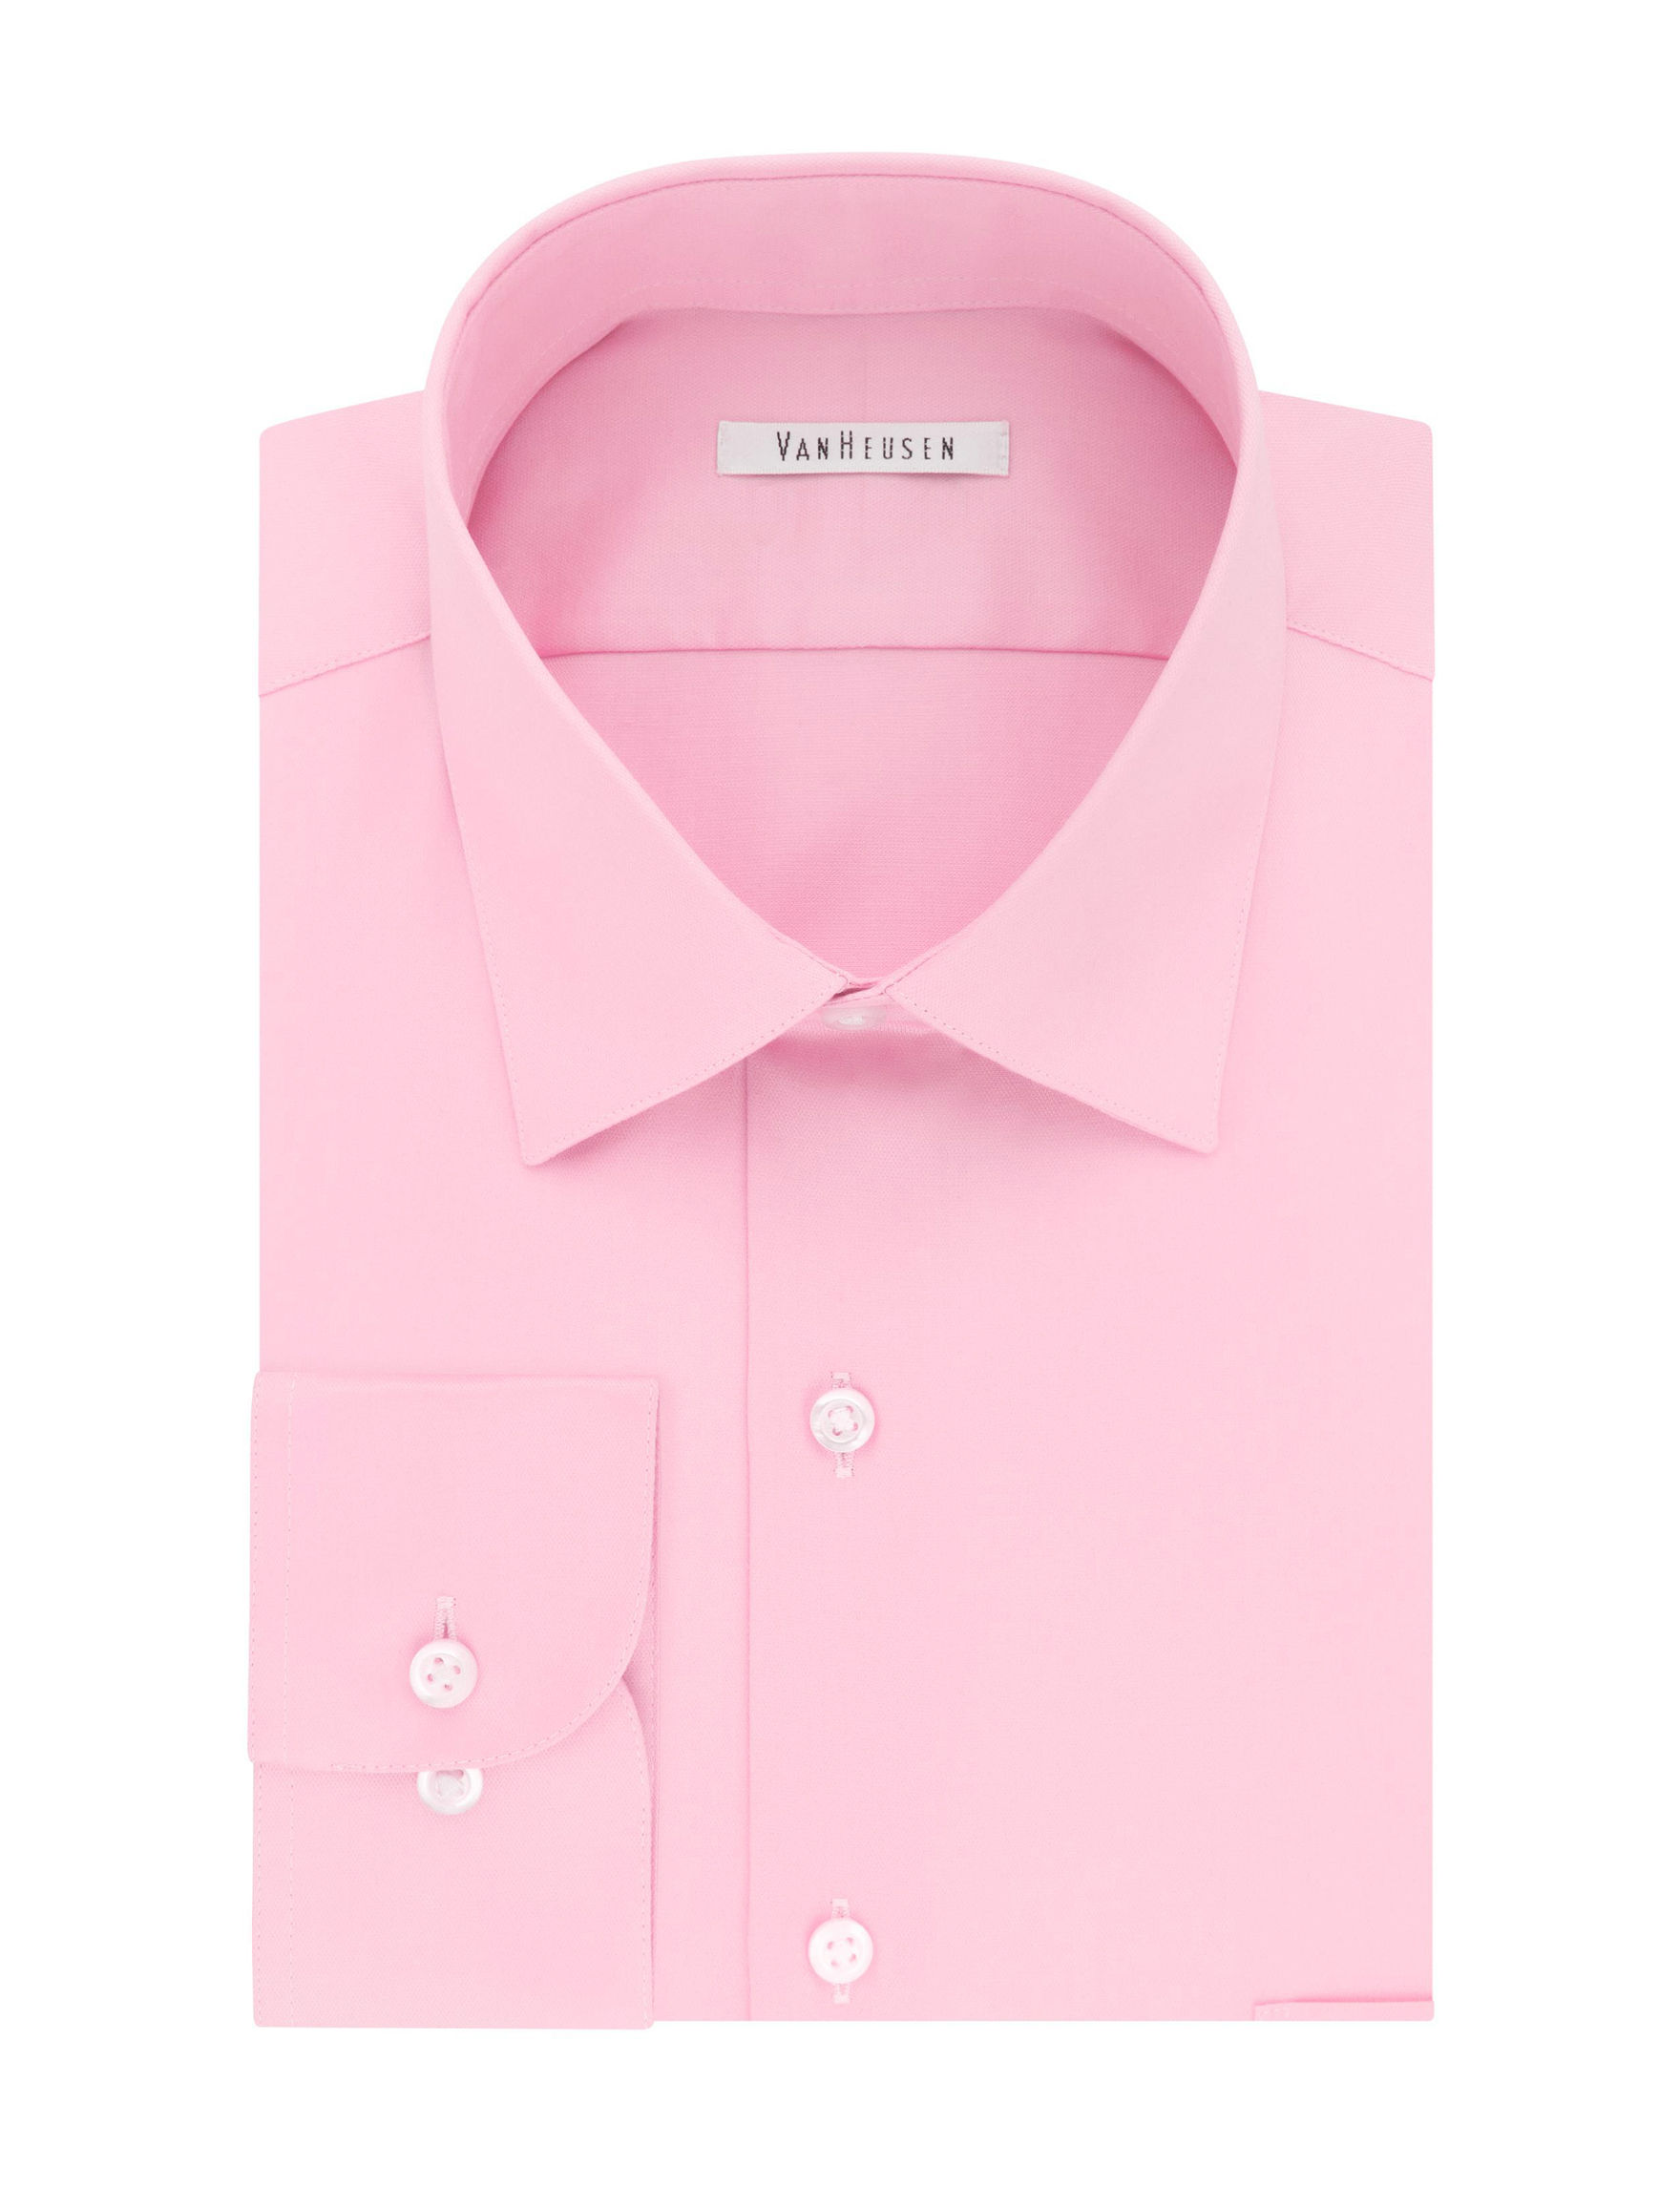 Van Heusen Pink Dress Shirts